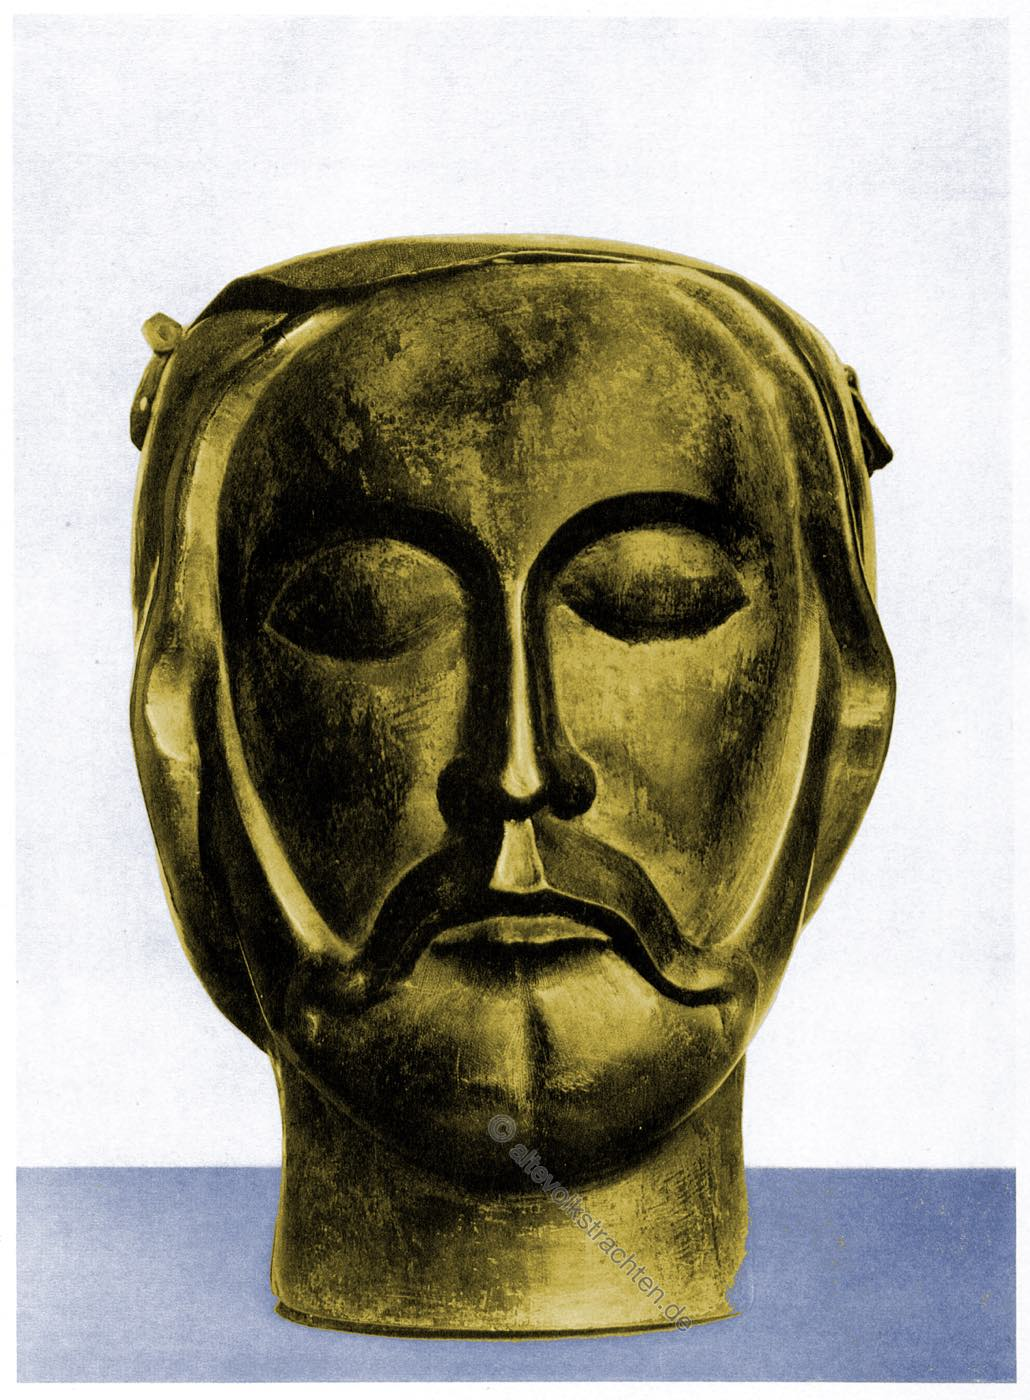 Kopfreliquiar, Frankreich, Bust reliquary, Buste-reliquaire, Busto reliquiario, Romanik, Mittelalter, Kunsthandwerk, Liturgie, Sakrale Kunst